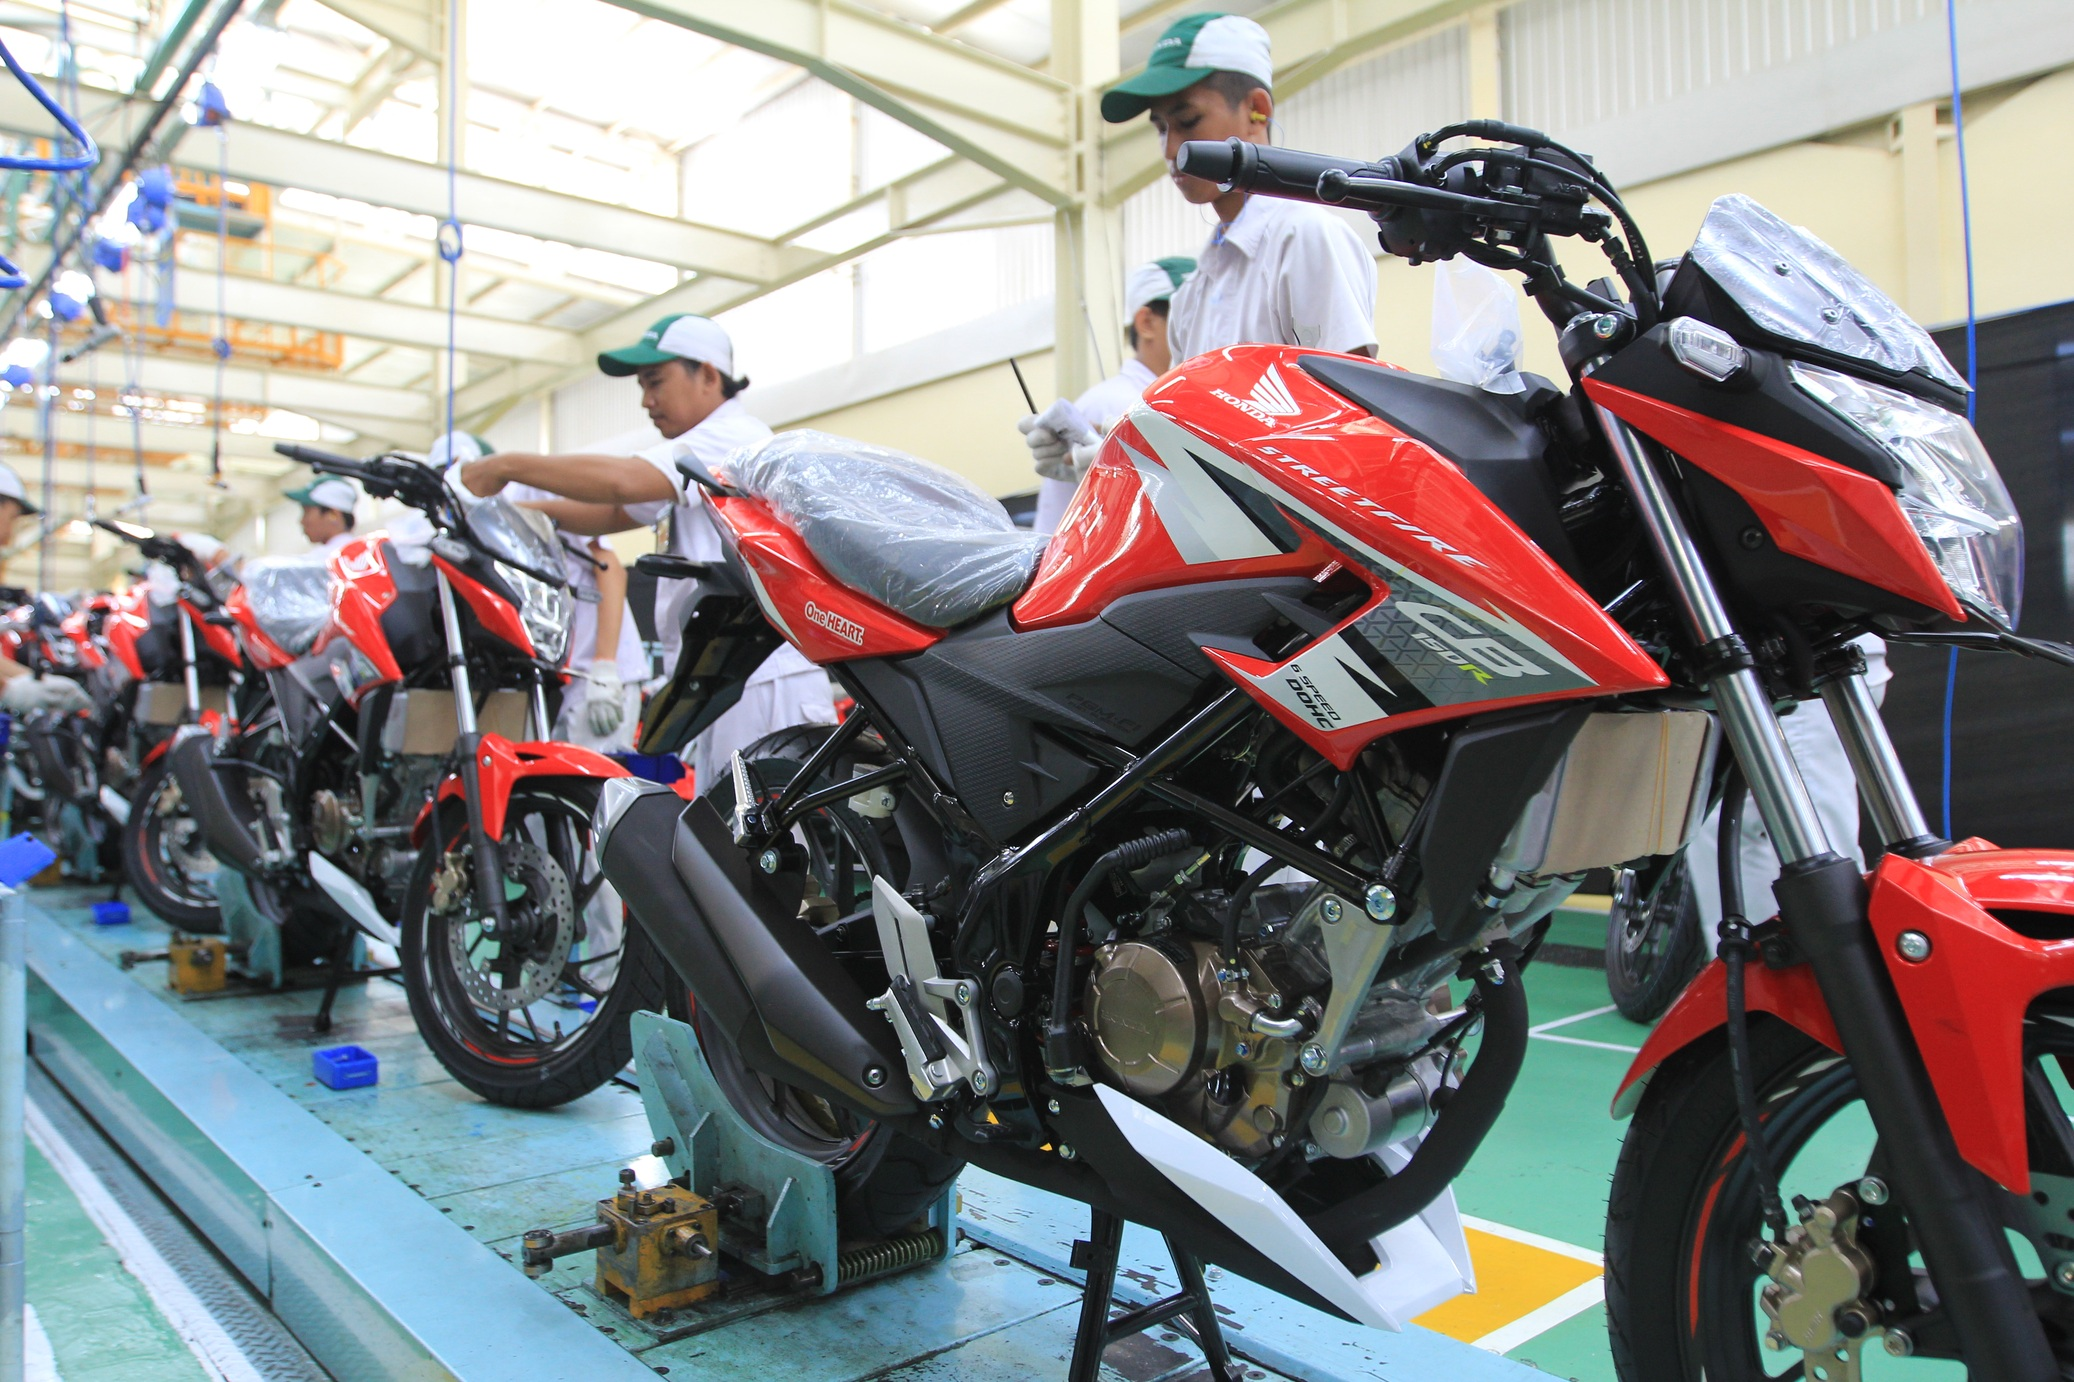 5 Pilihan Warna All New Honda CB150R Terbaru 2017 Nih Spesifikasi